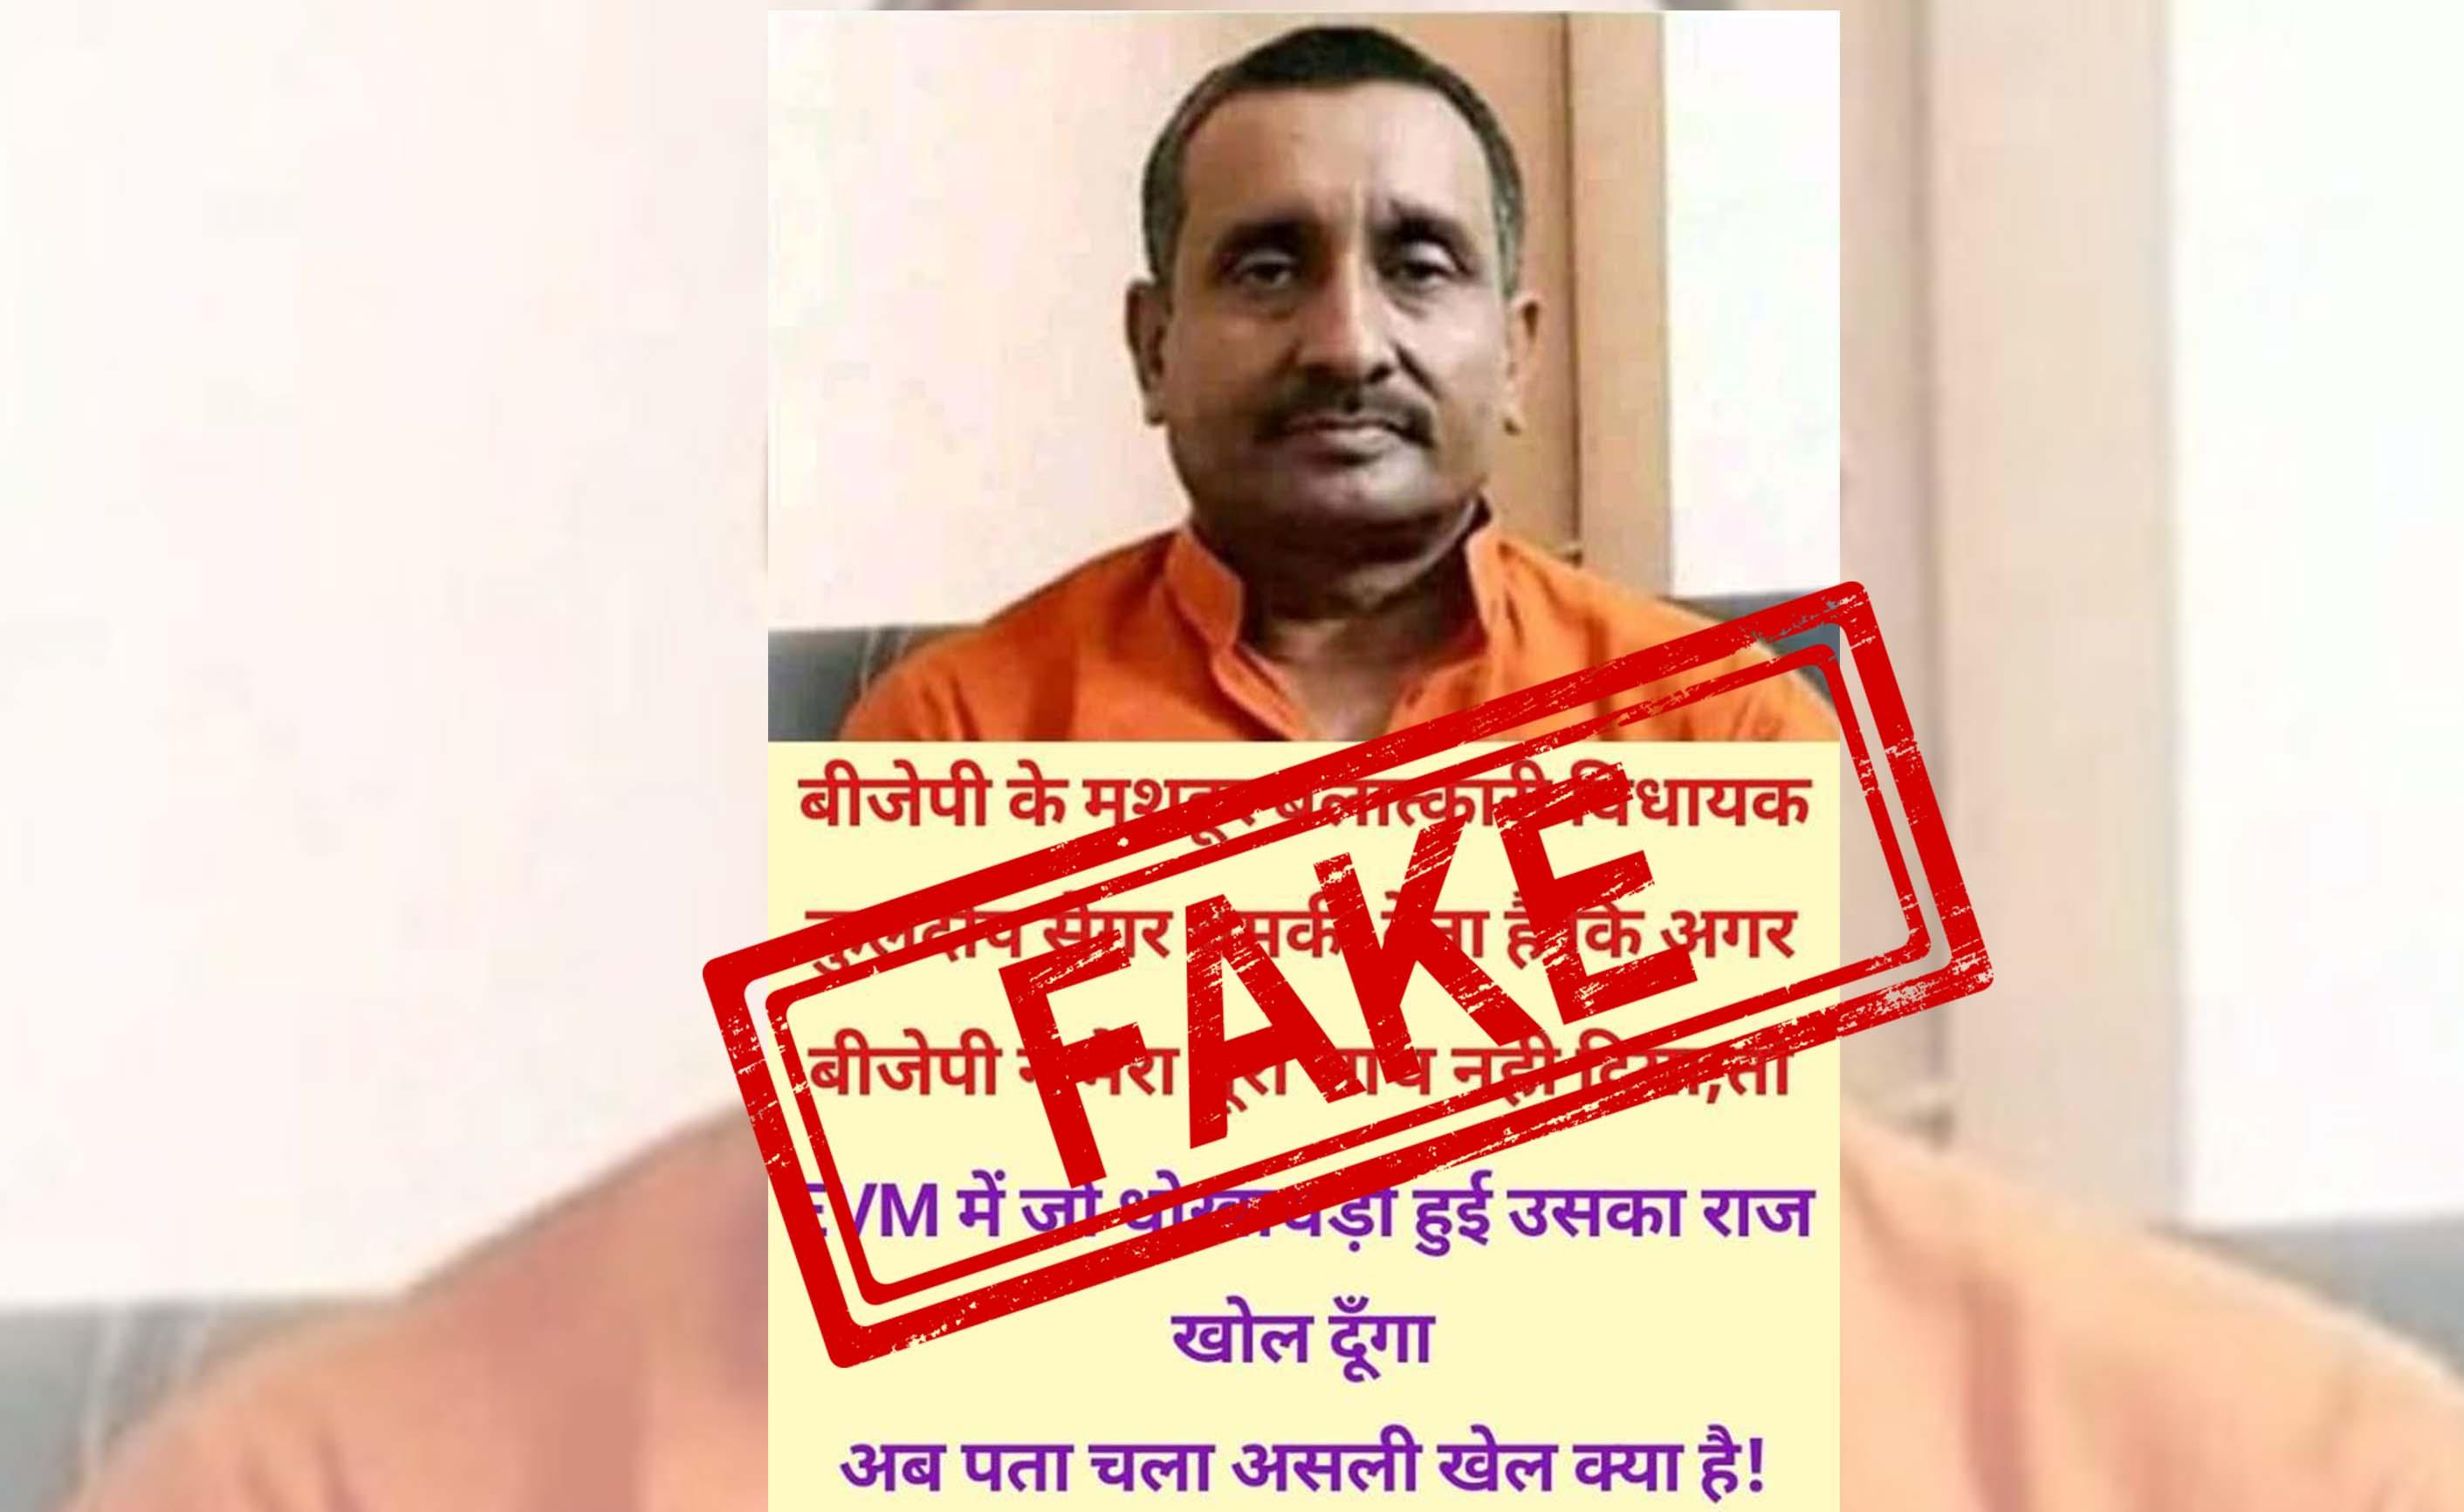 Unnao, rape, Case, Accused, Kuldeep Sengar, BJP, EVM, NewsMobile, Mobile, news, India, Fact Check, Fact Checker, Fake, News